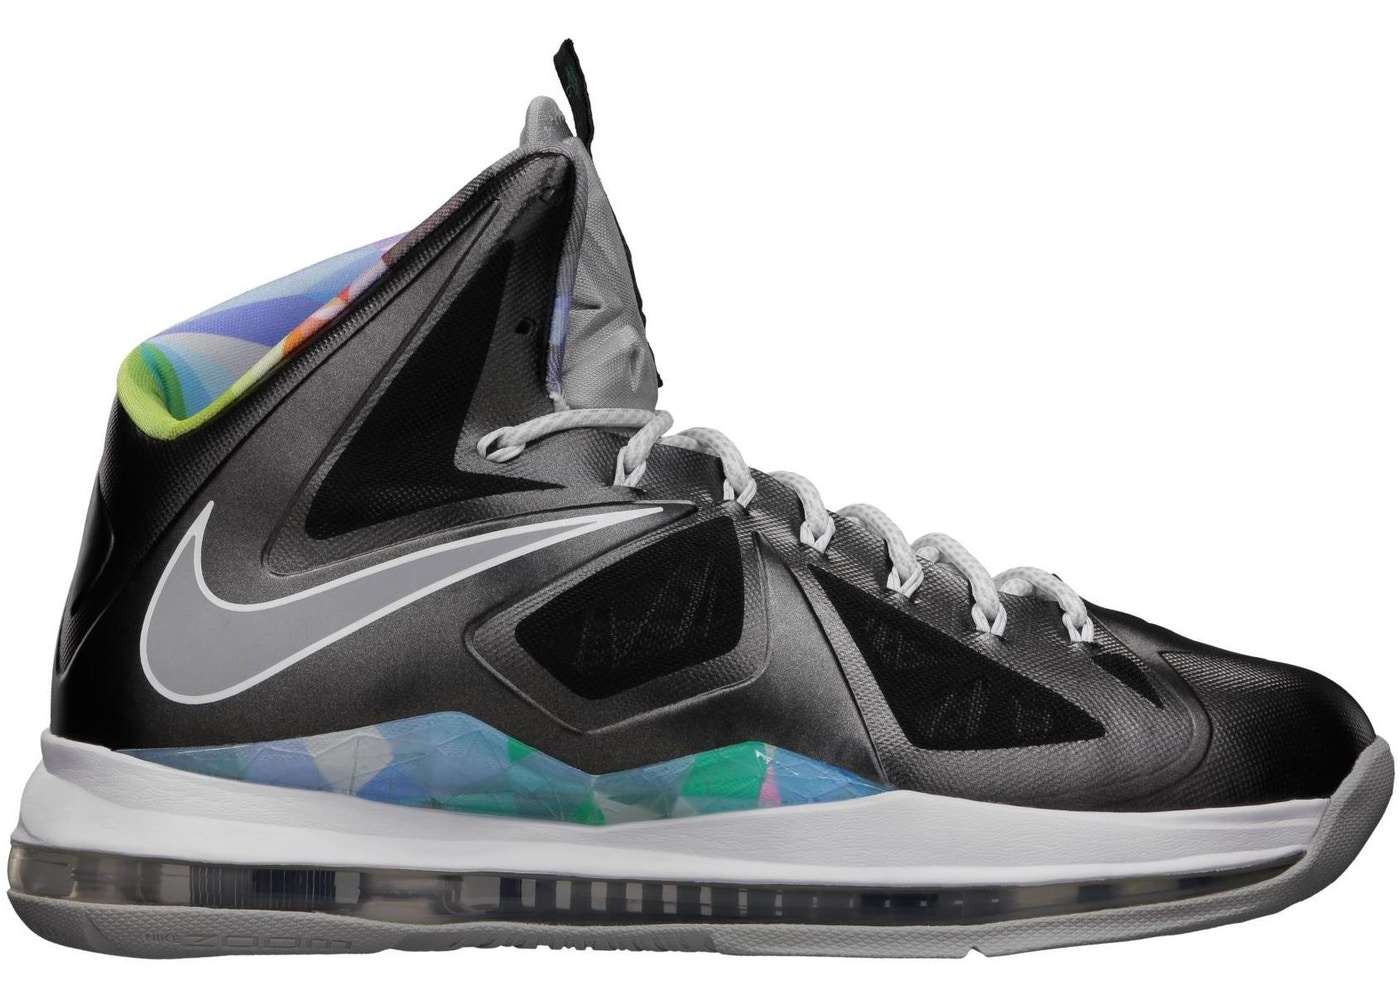 Nike LeBron 10 Shoes - Average Sale Price 7d7aad49d56e